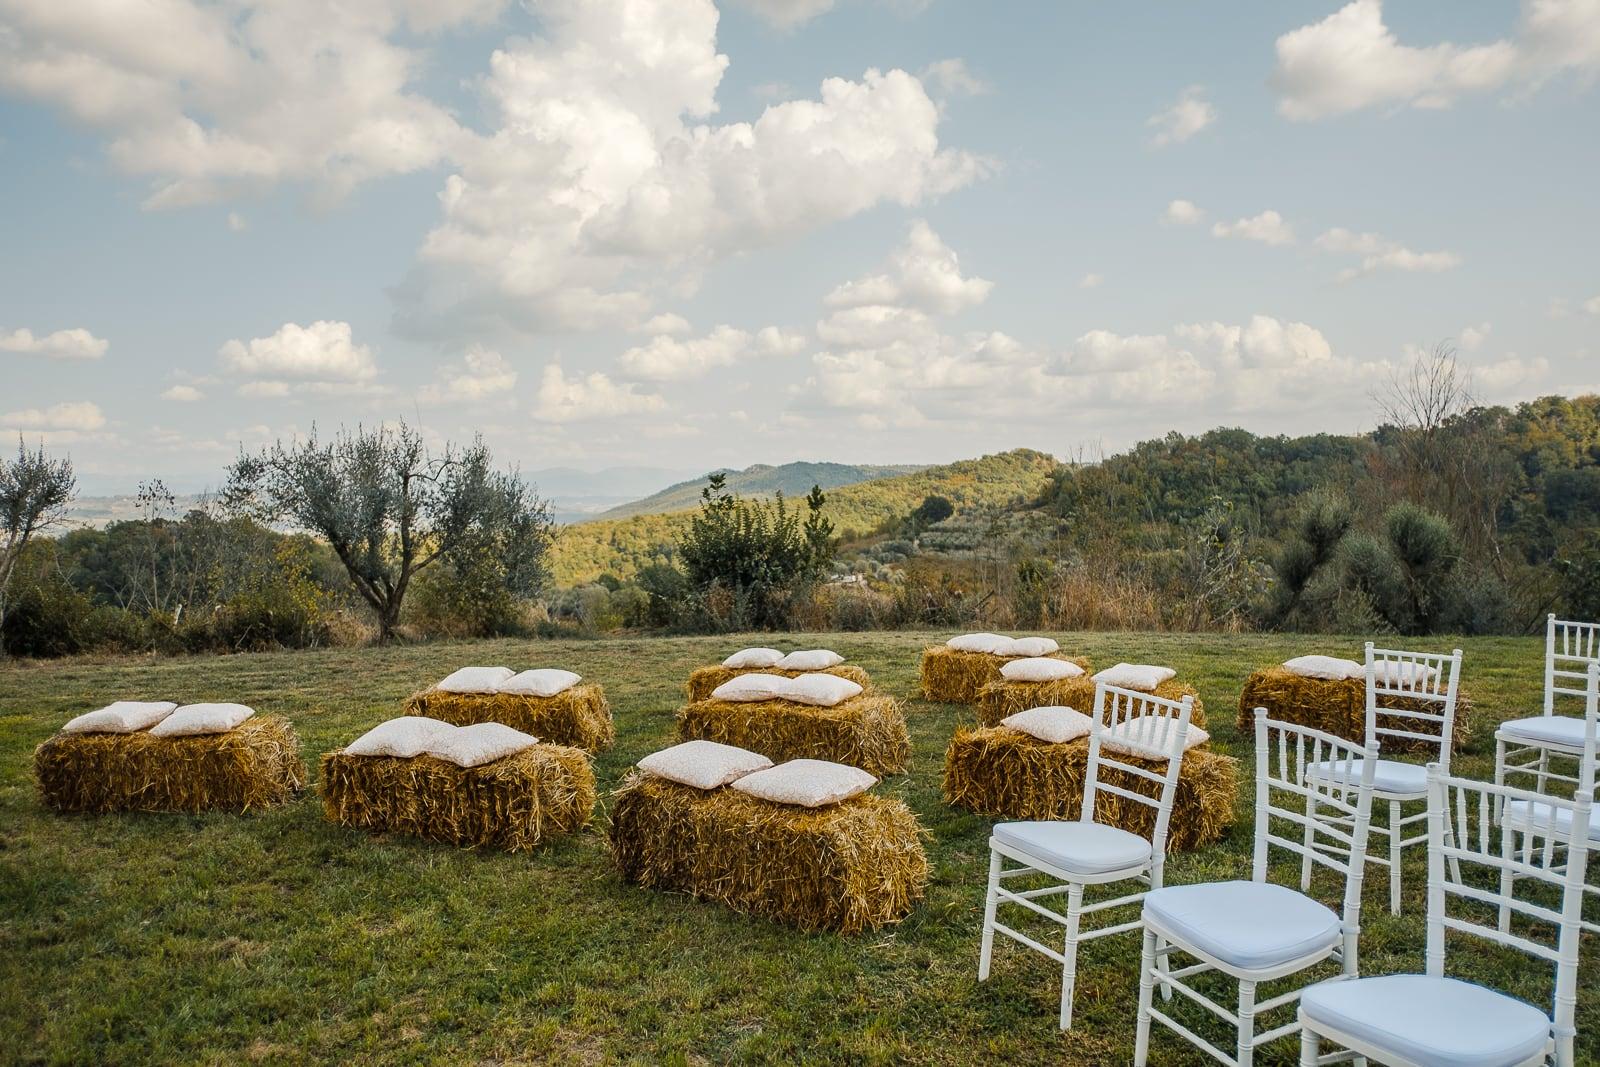 matrimonio_bomarzo_il giardino e la dimora_dettagli